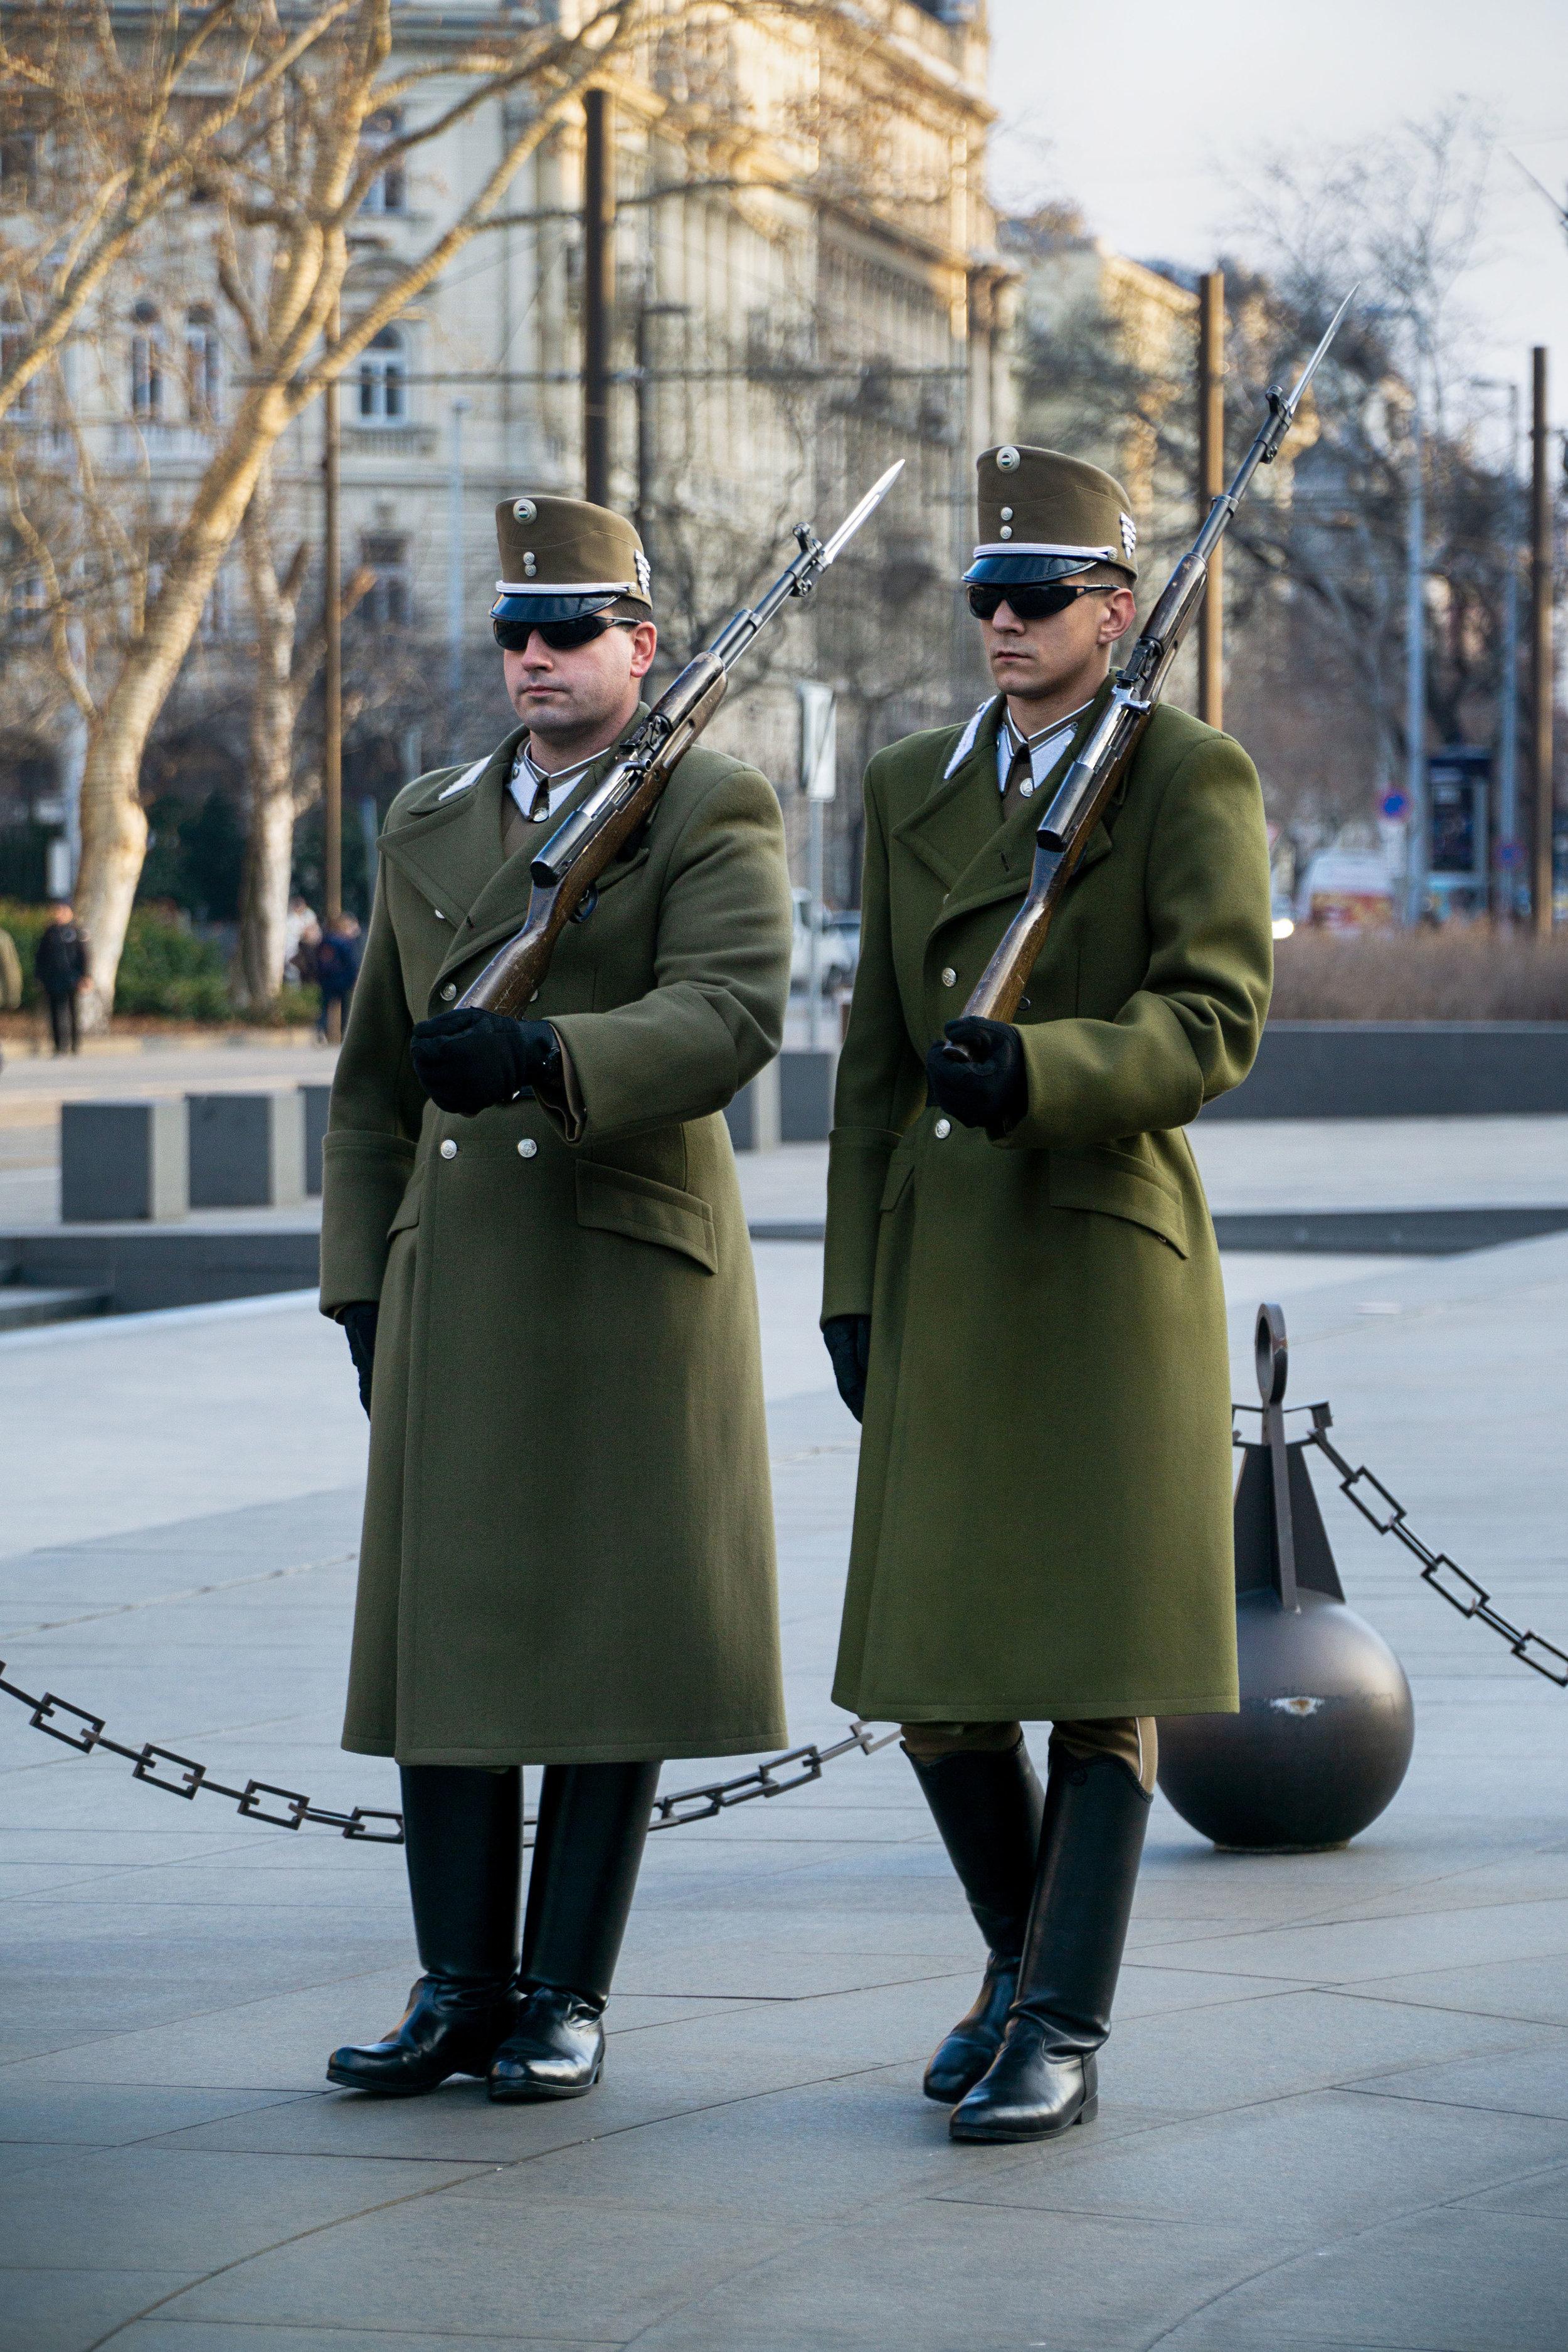 budapest_parliament_building_guards_vickygood_travel_photographysm.jpg